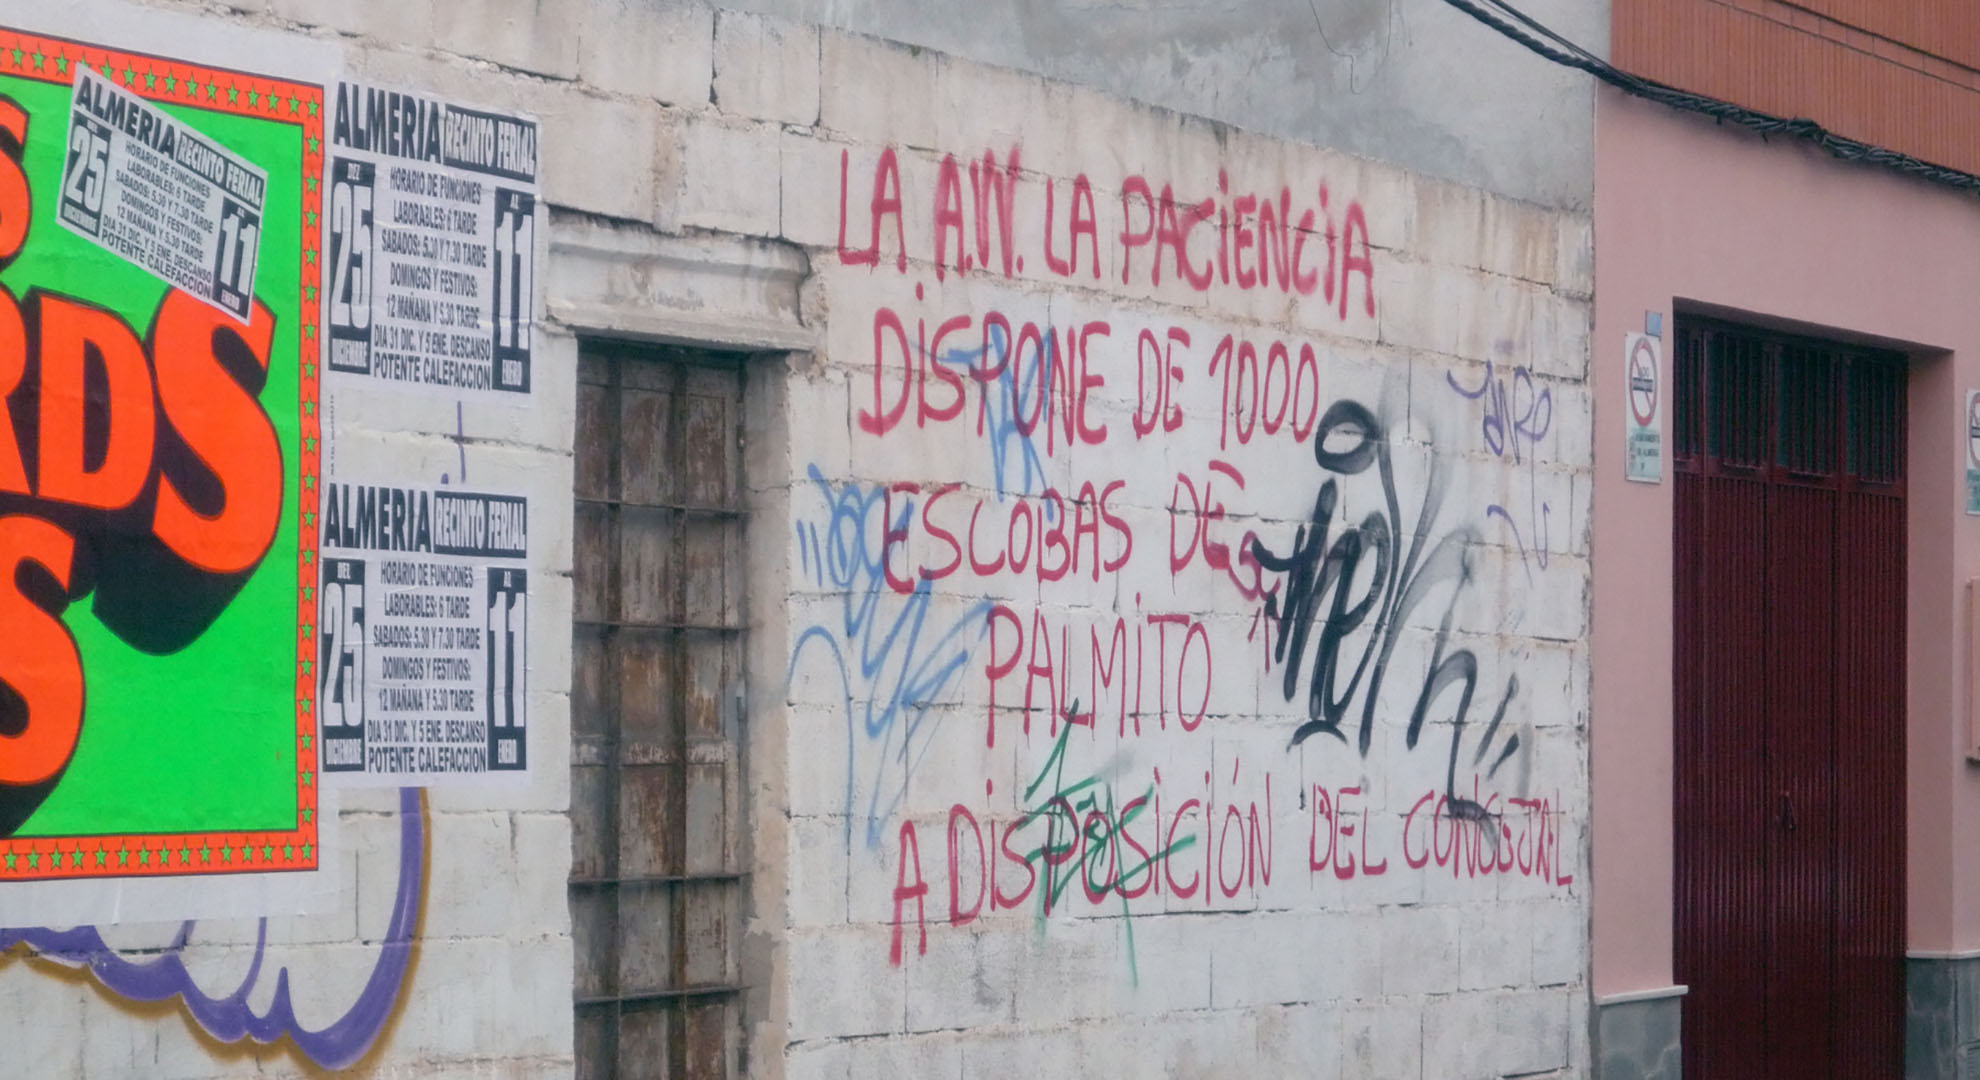 Graffiti in Almería in a pre-gentrified area without civility